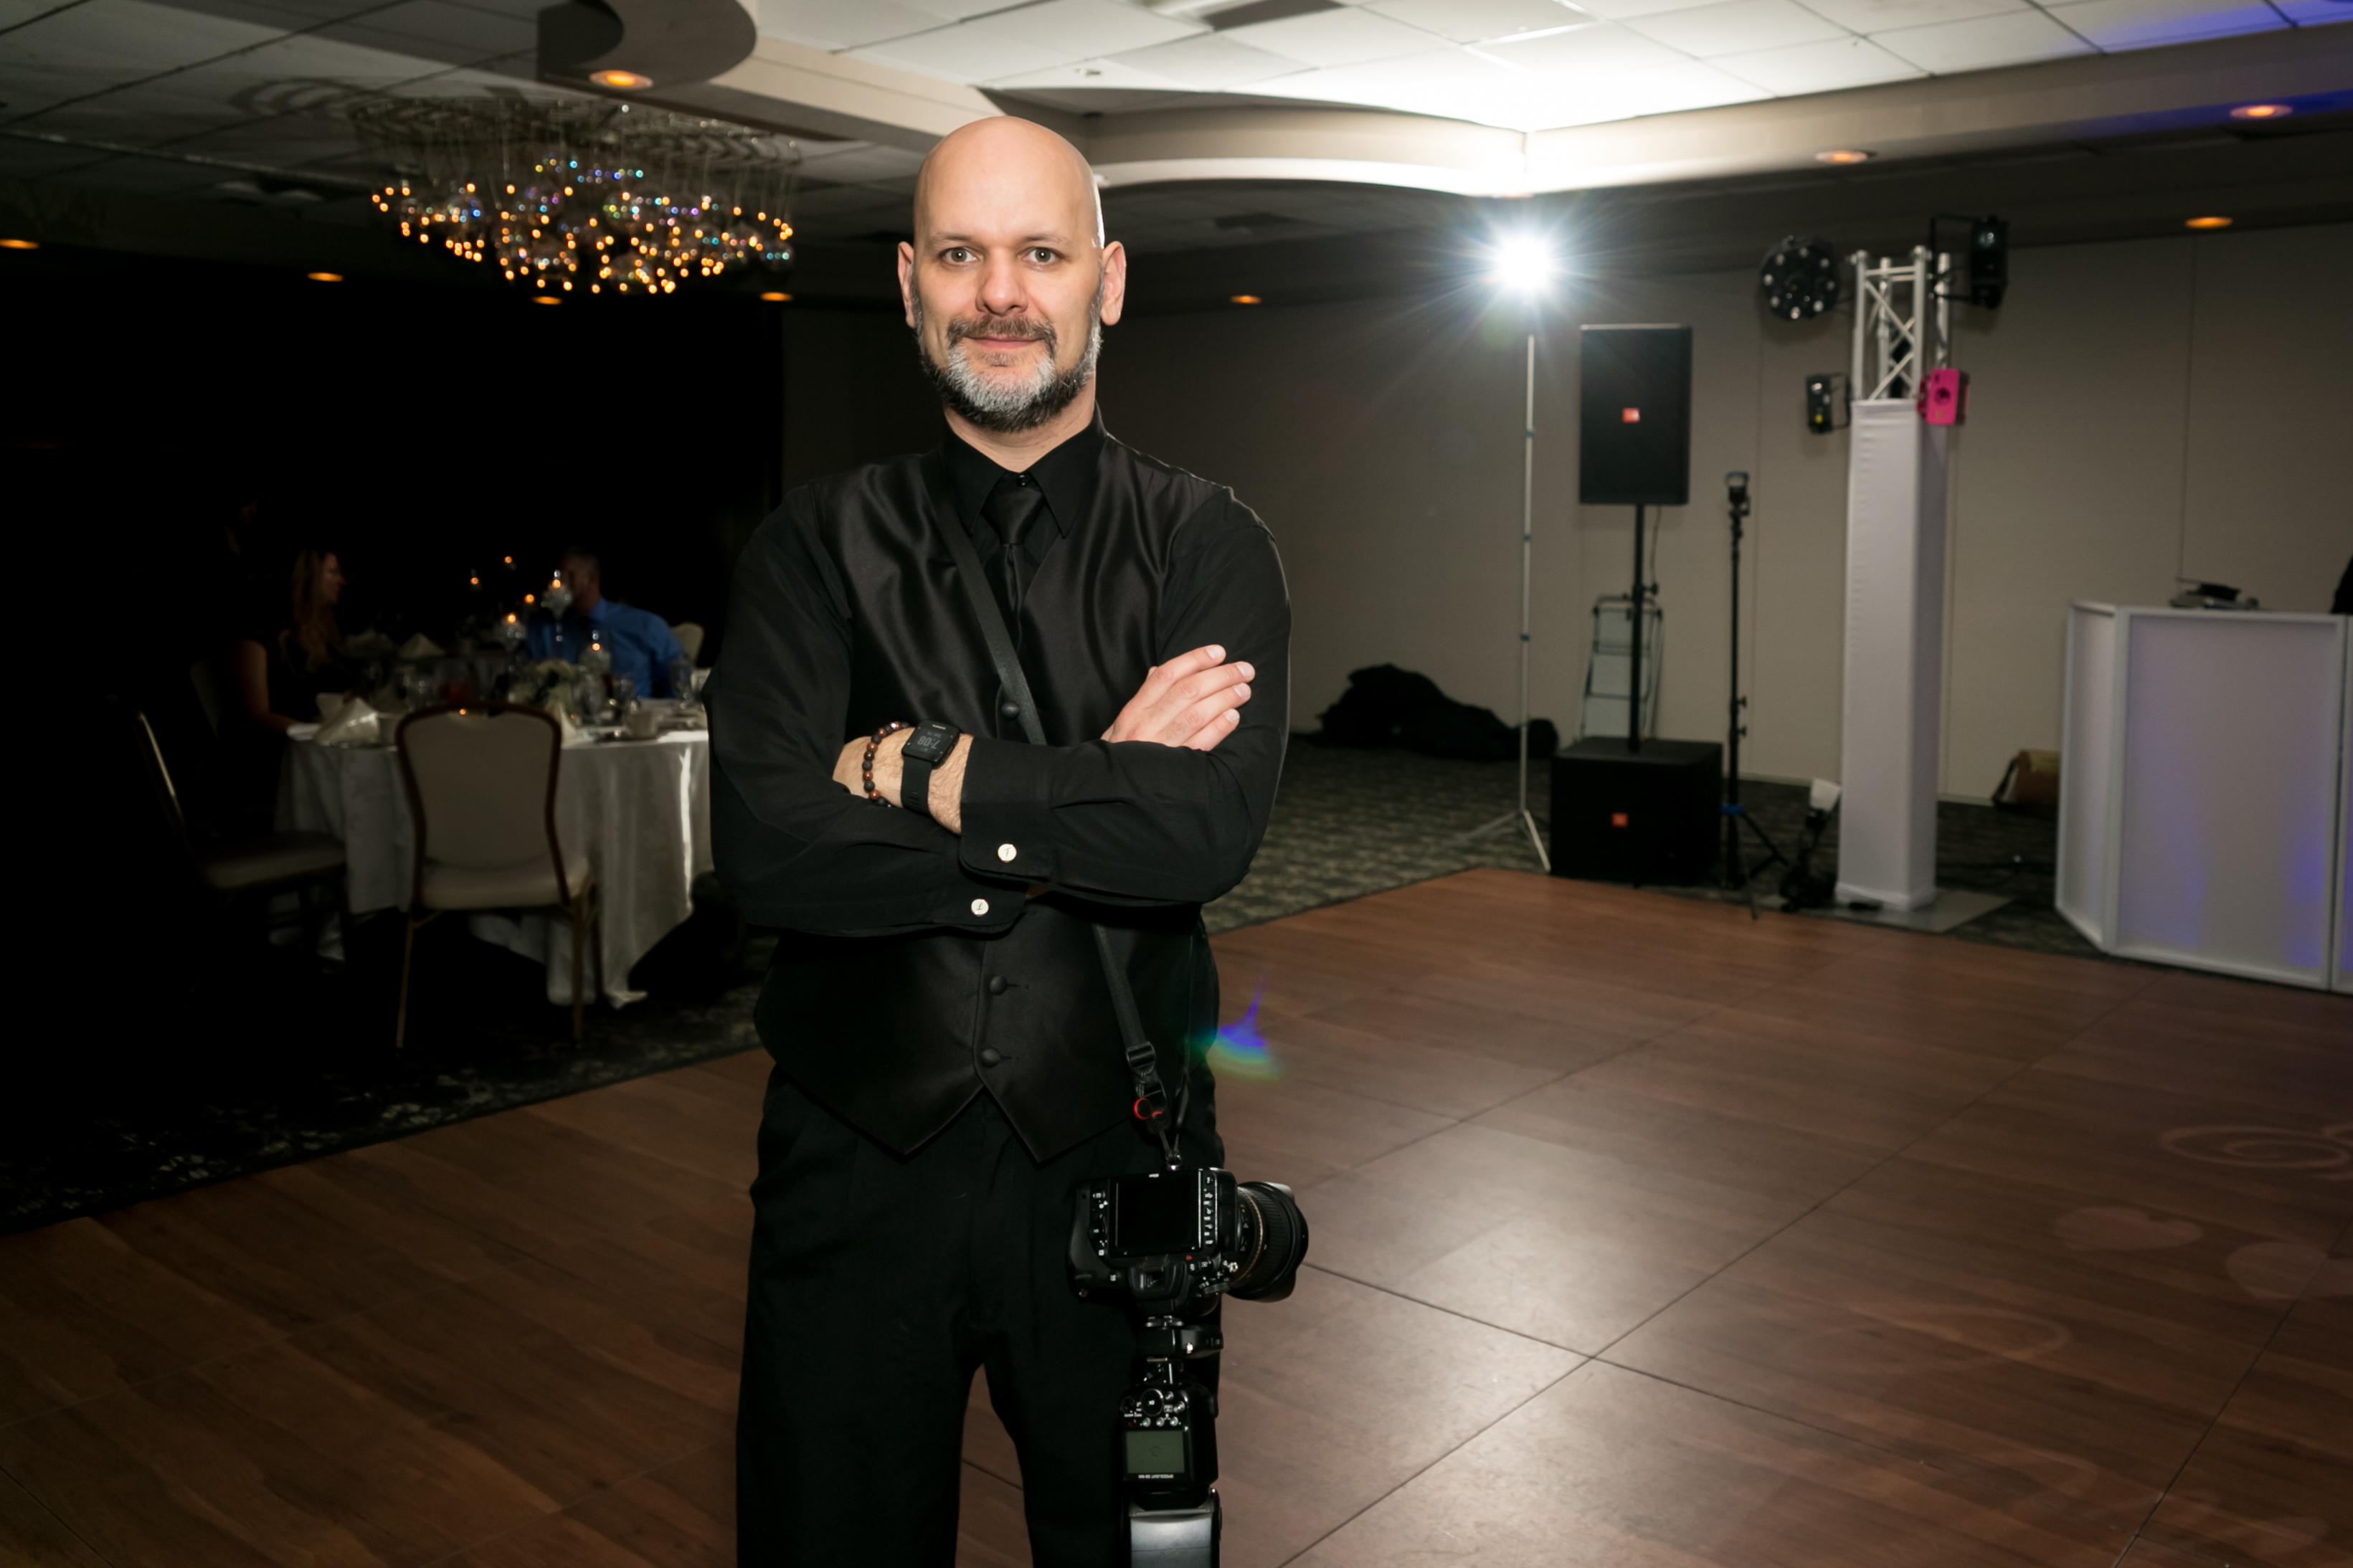 Wedding Photographer's Advice to Brides & Grooms